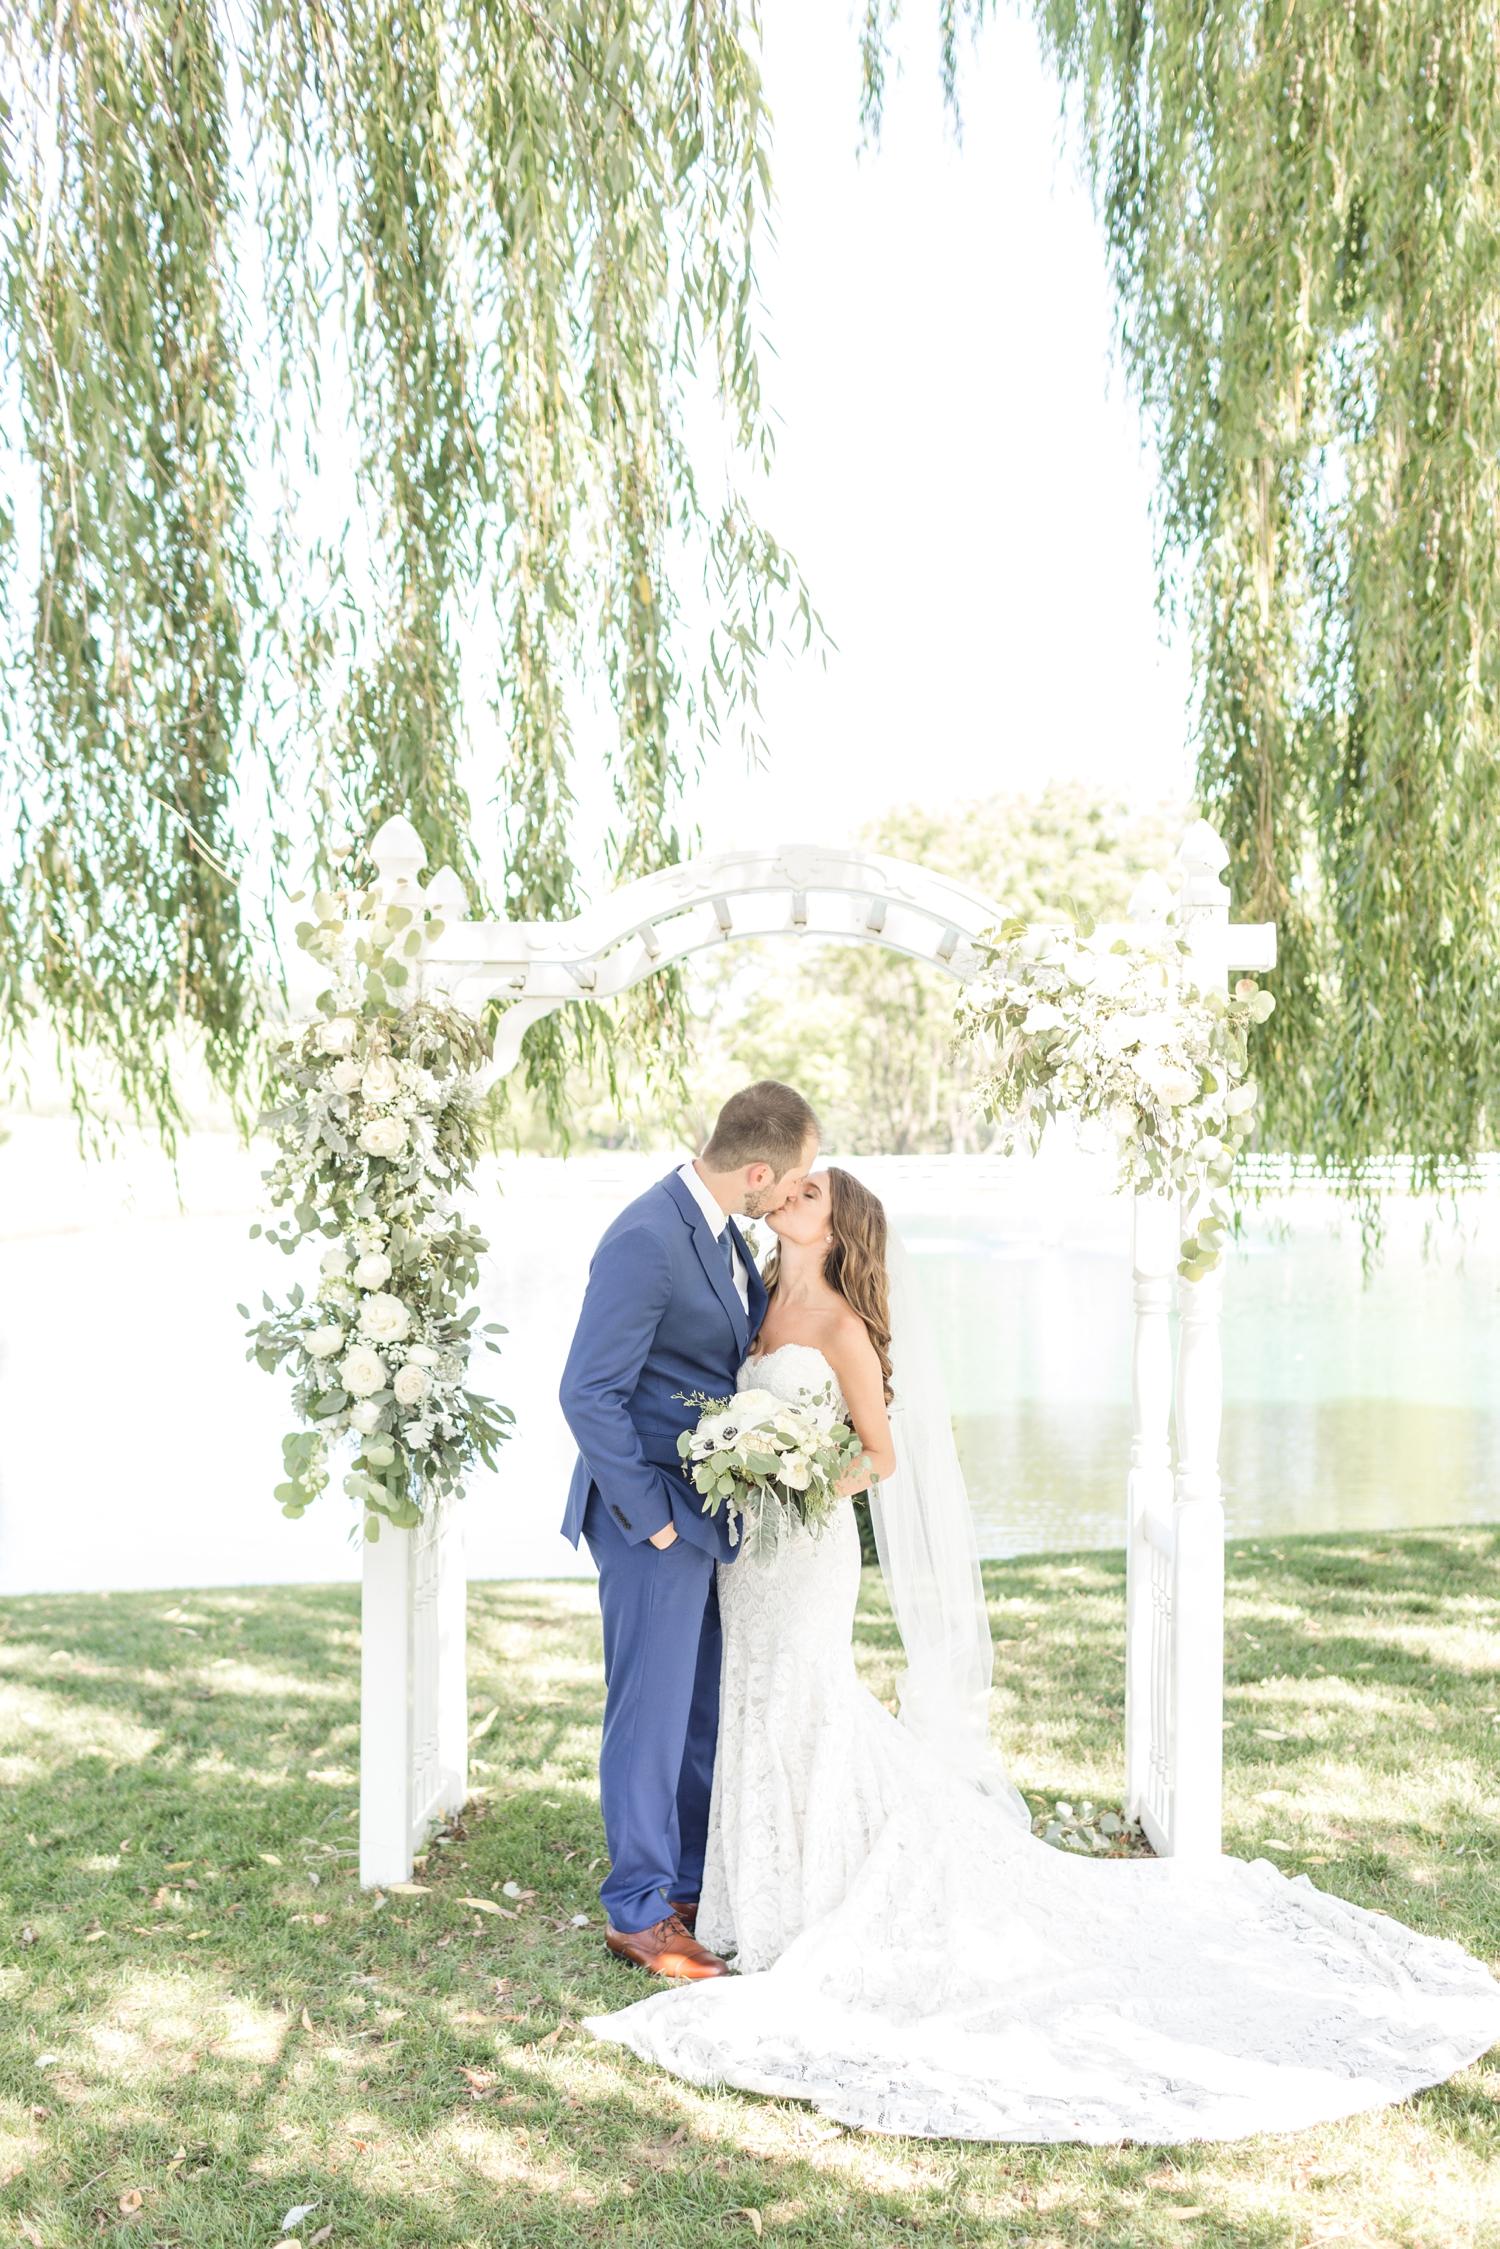 Webb WEDDING HIGHLIGHTS-215_Pond-View-Farm-wedding-Maryland-wedding-photographer-anna-grace-photography-photo.jpg